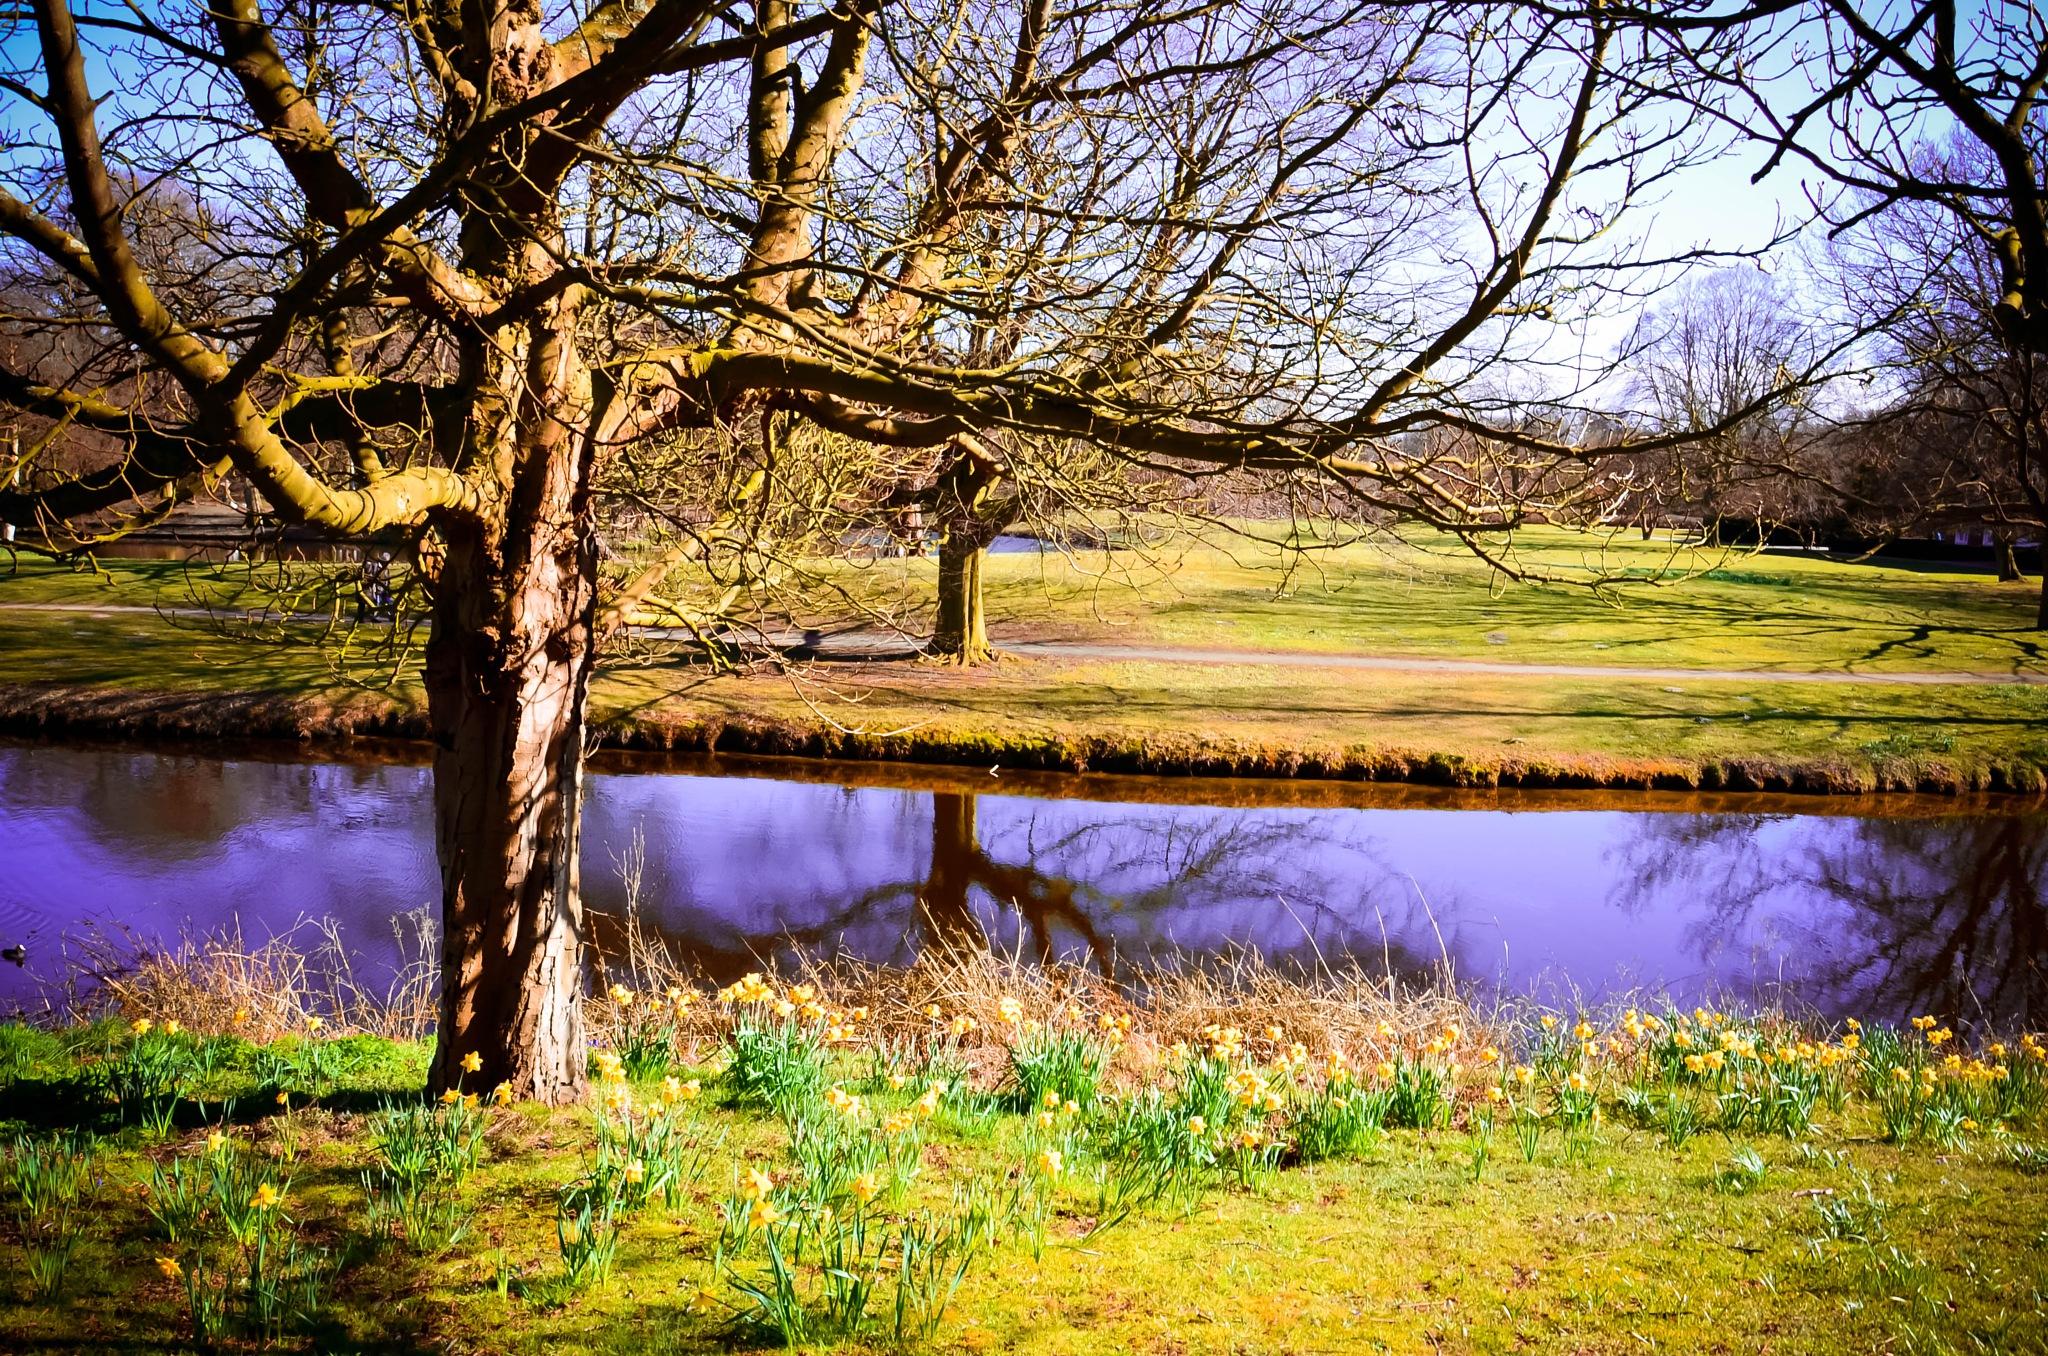 springtime in the park by Cristina Loghin